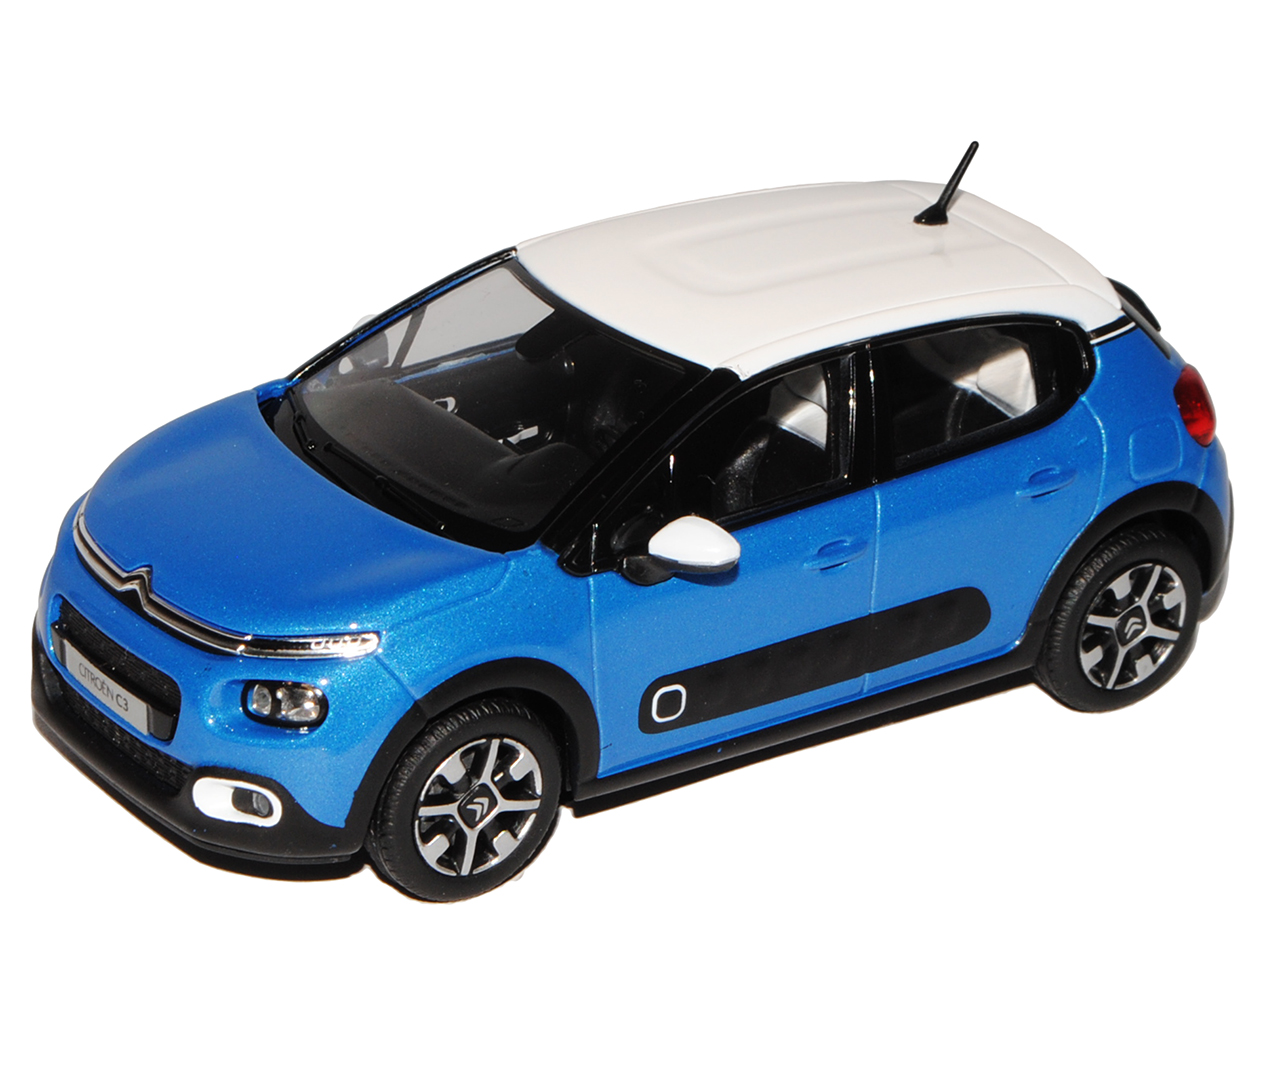 Citroen C3 blue mit whiteem Dach 3. Generation Generation Generation Ab 2016 1 43 Norev Modell Auto m.. 5d813d